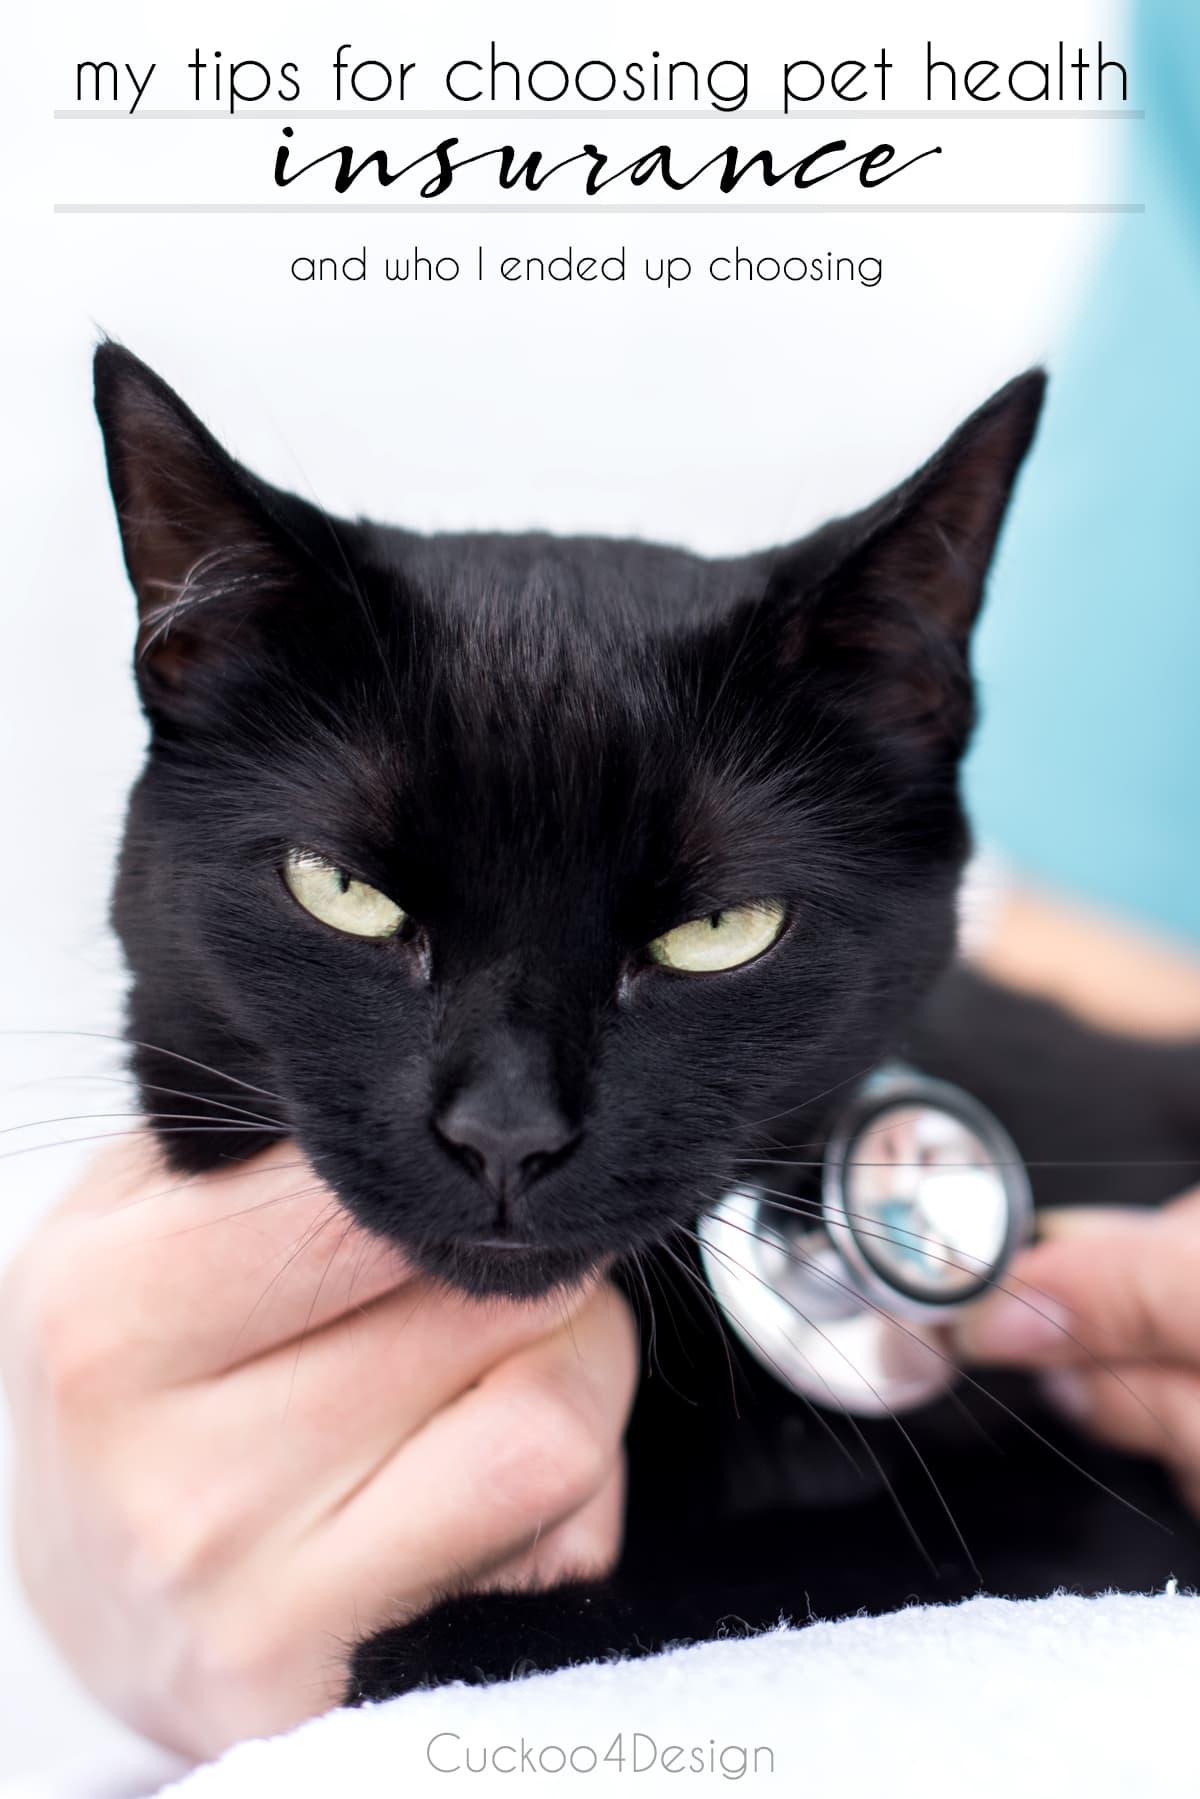 my tips for choosing pet health insurance